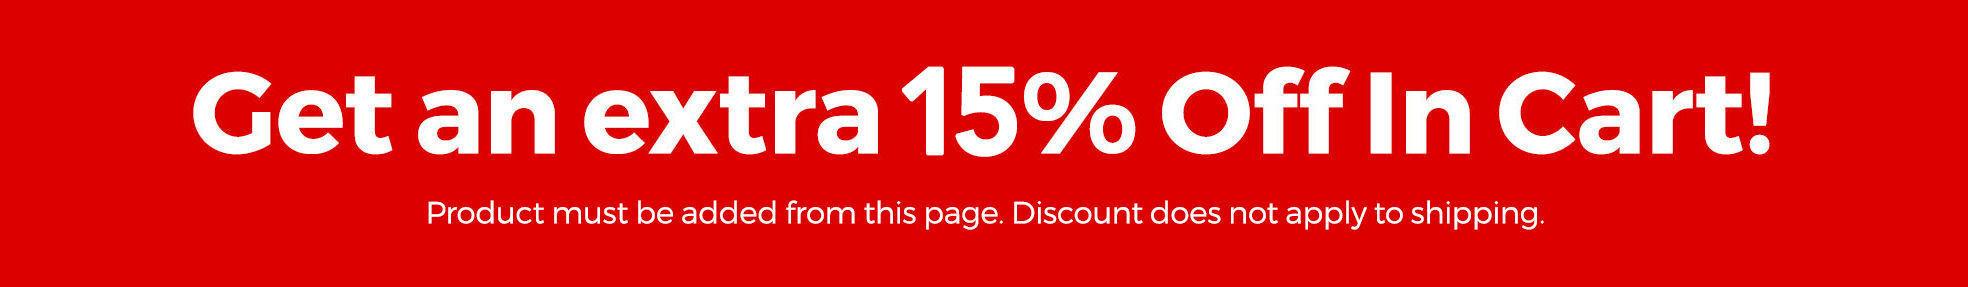 Get 15% Off In Cart: Finder Christmas Deals!